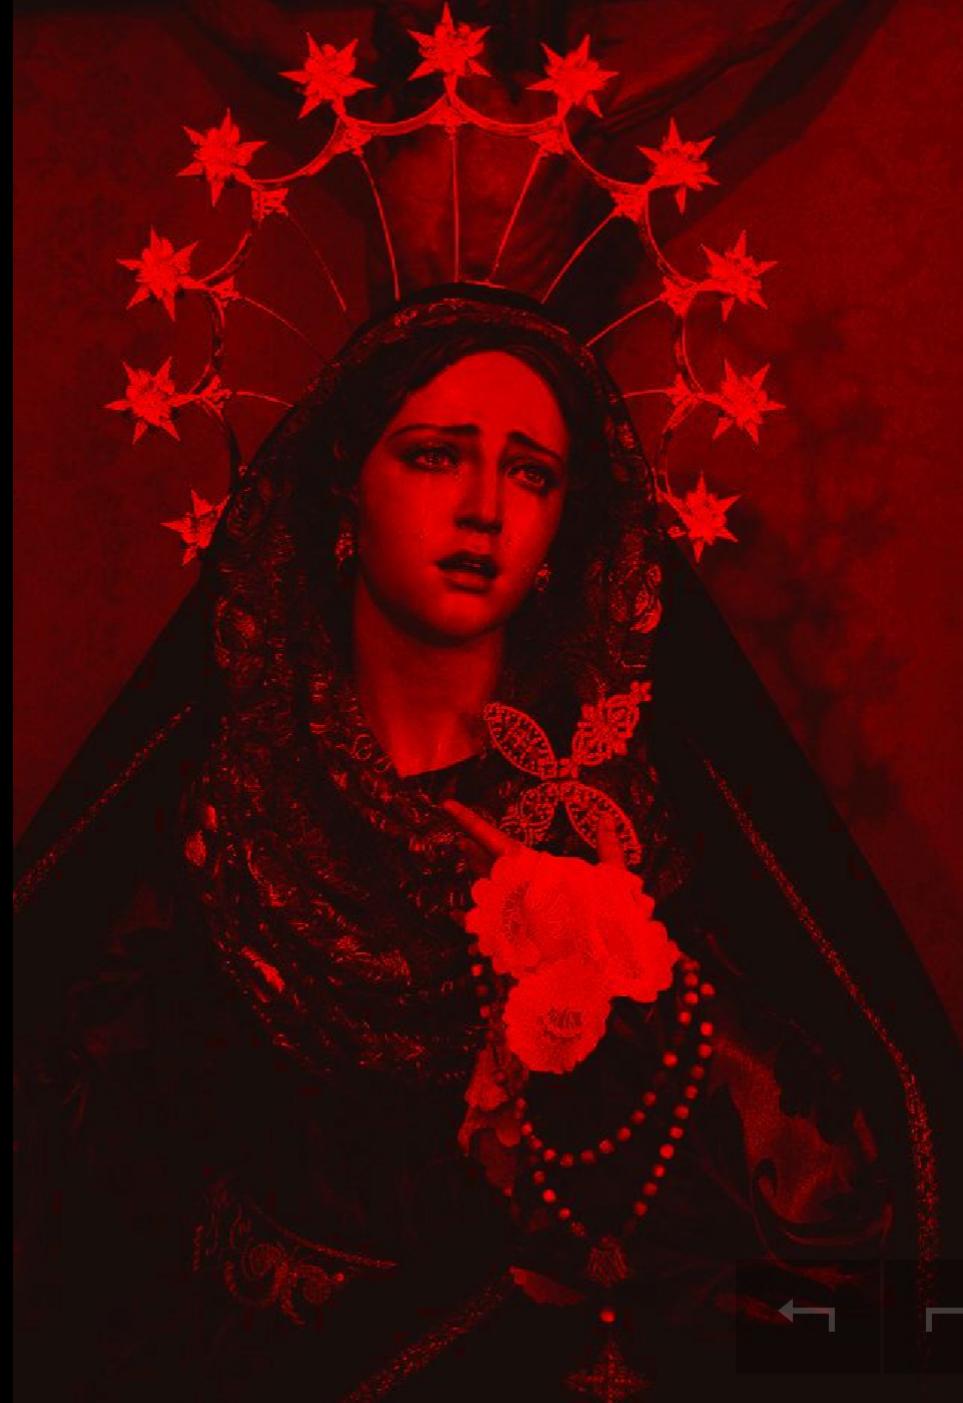 Red Aesthetic Wallpaper Tumblr